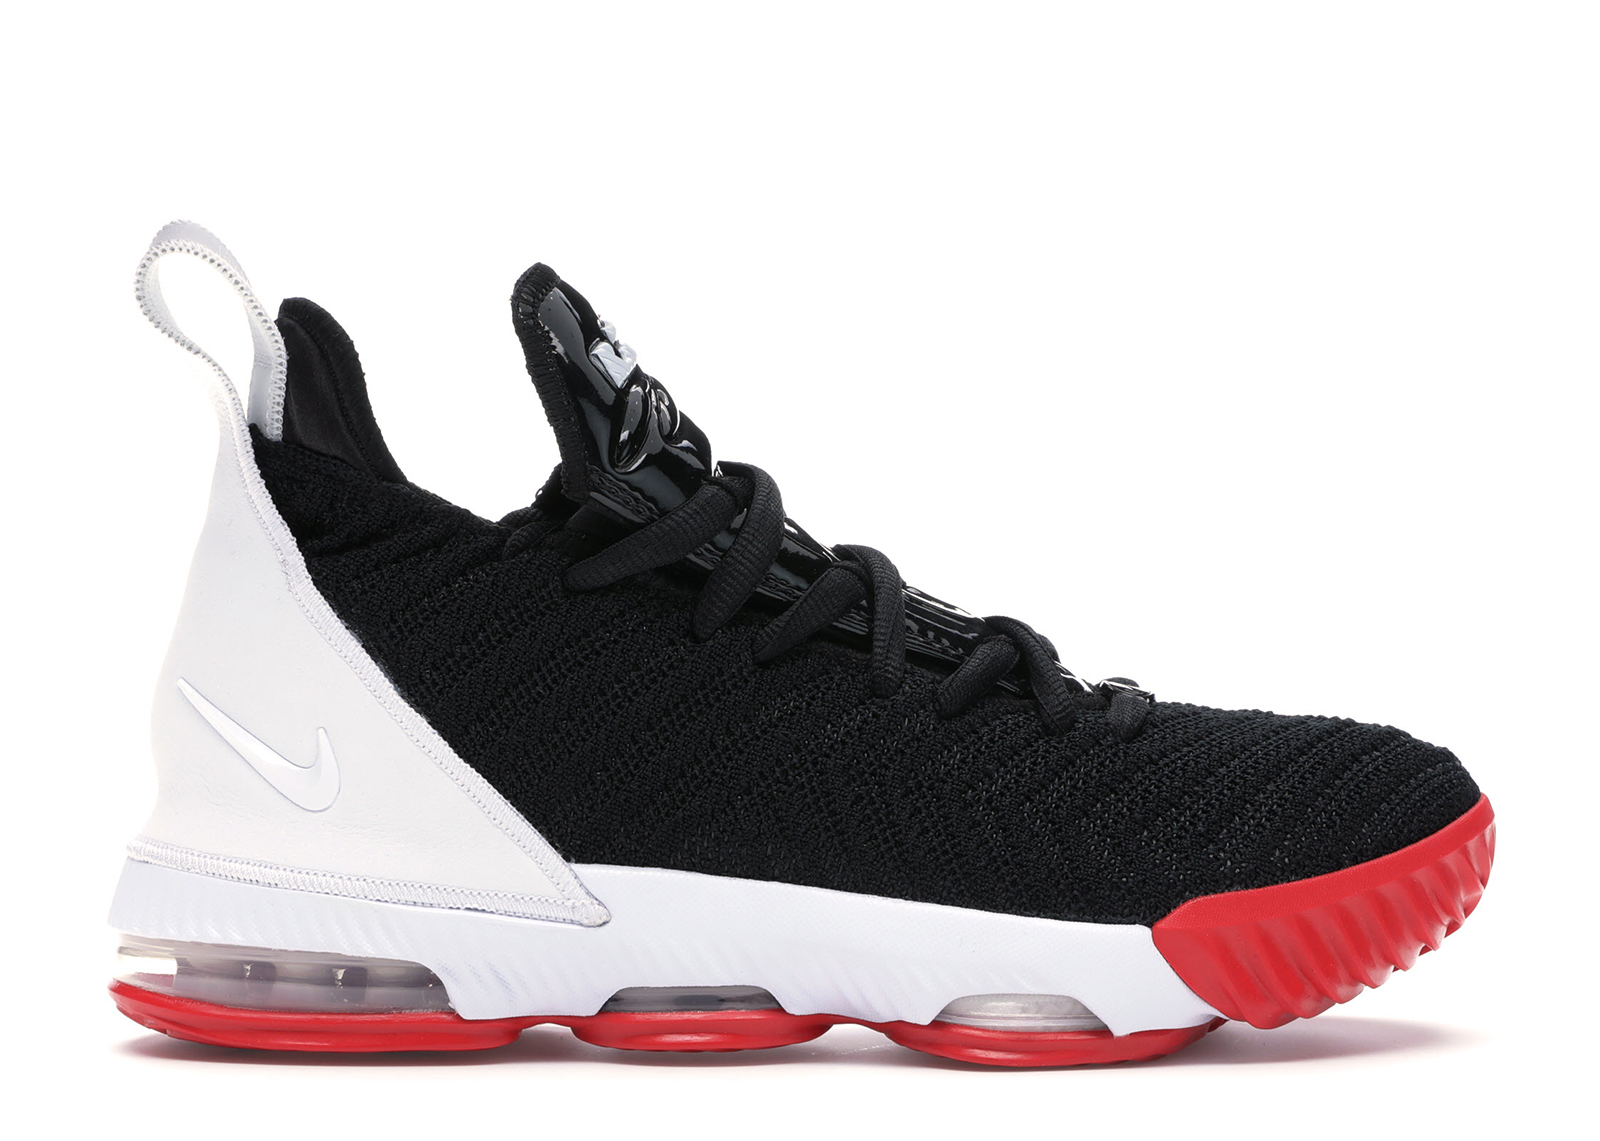 Nike LeBron 16 Red Carpet (GS) - AQ2465-016